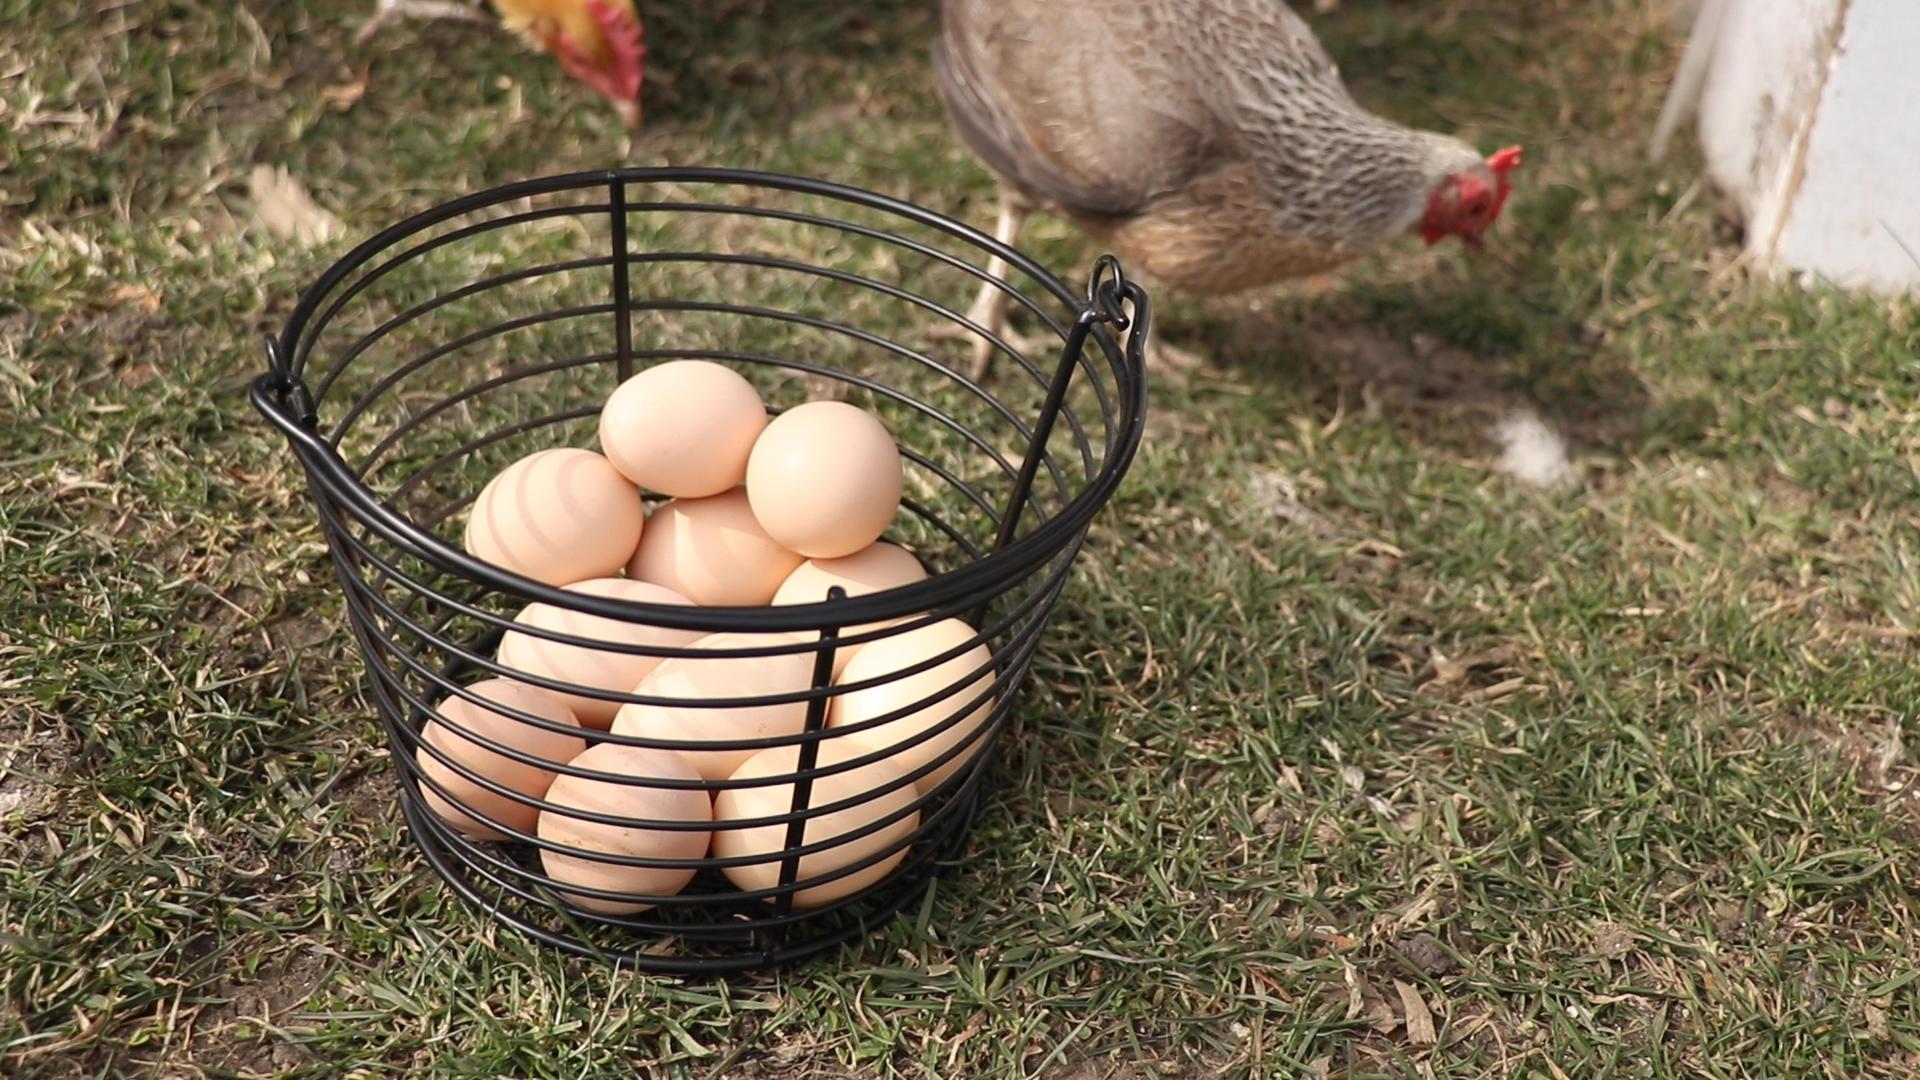 Fresh-picked eggs